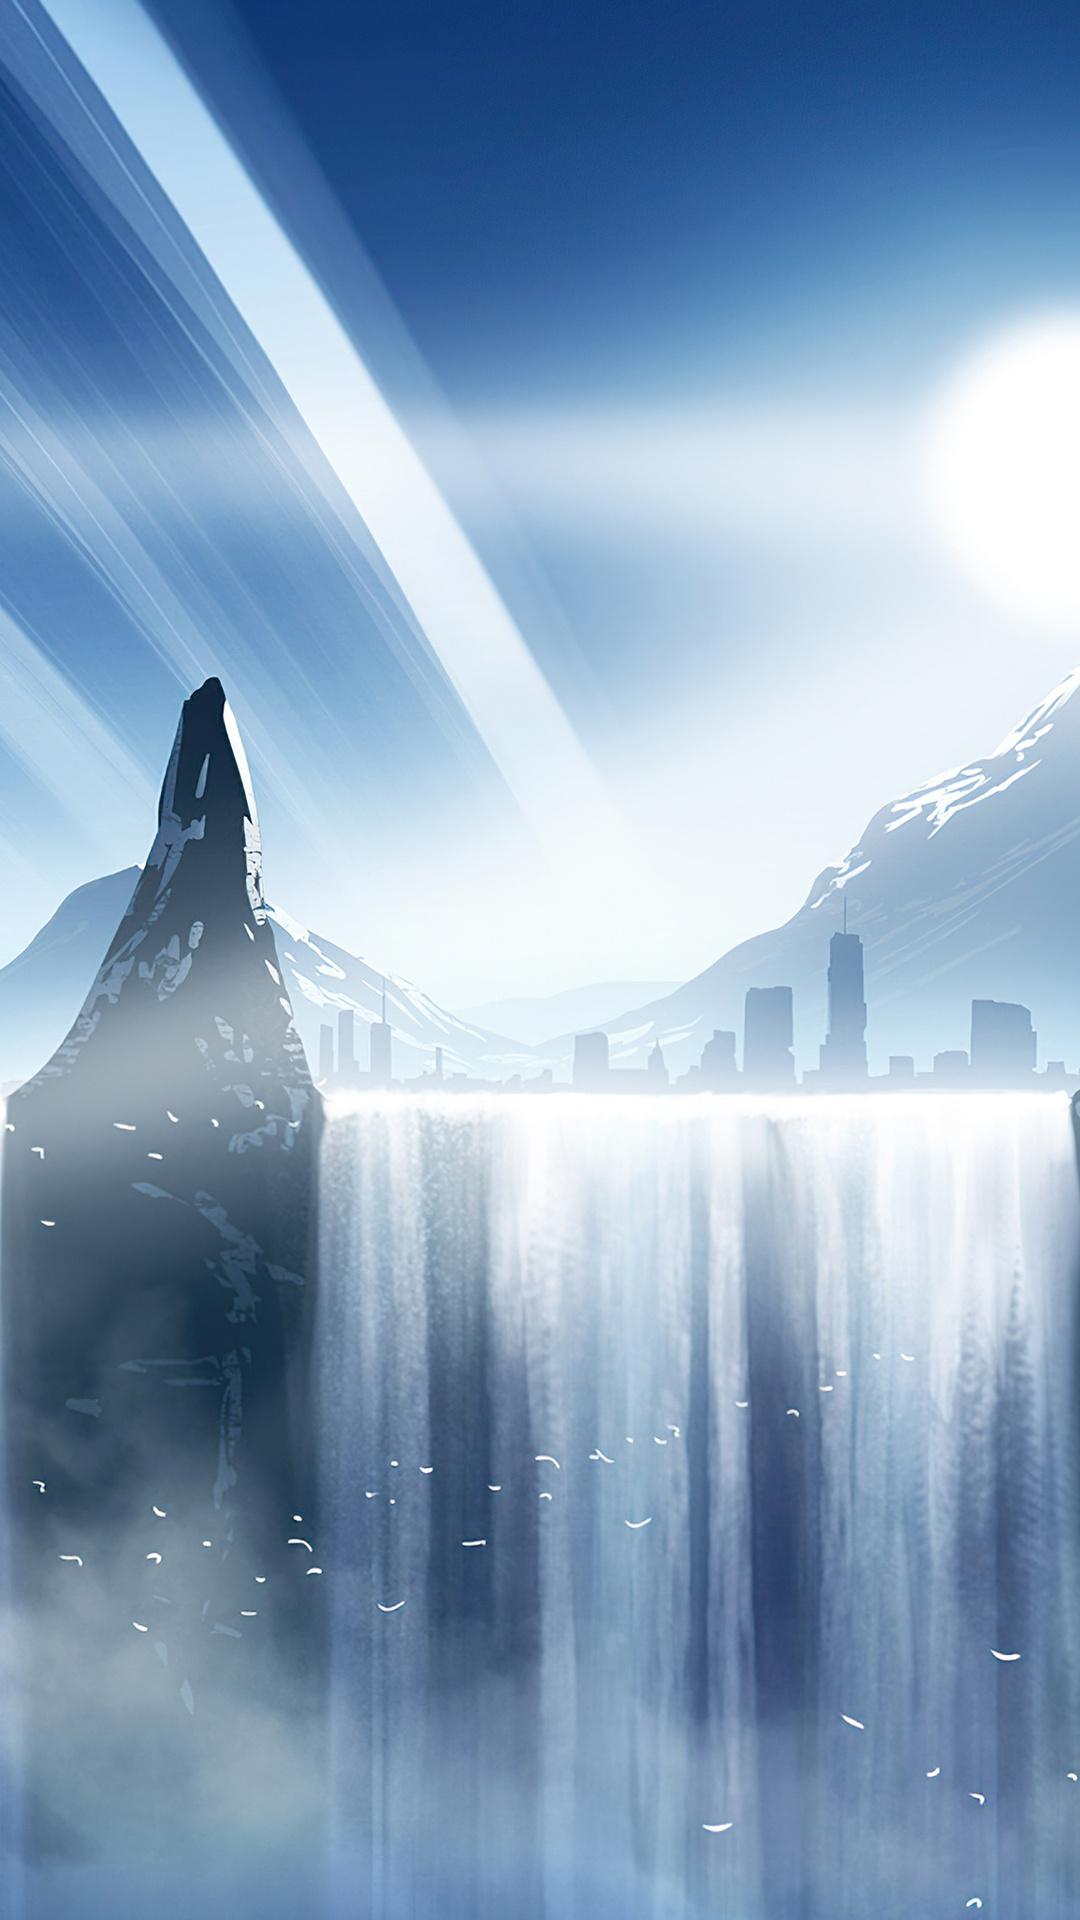 waterfall-nature-digital-scenery-4k-dh.jpg